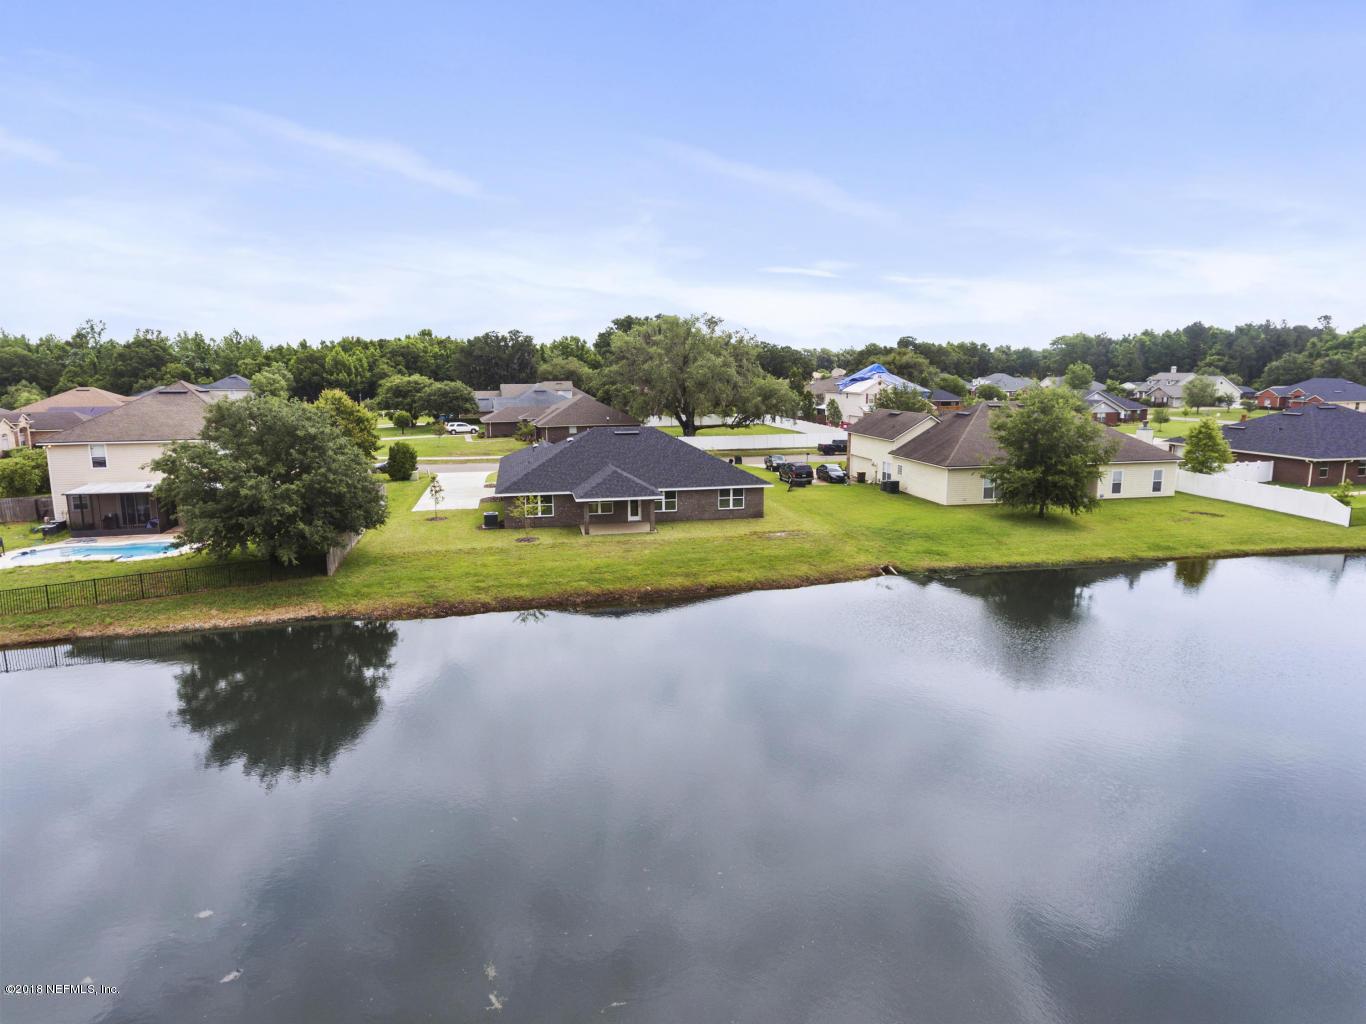 8188 SIERRA OAKS, JACKSONVILLE, FLORIDA 32219, 4 Bedrooms Bedrooms, ,2 BathroomsBathrooms,Residential - single family,For sale,SIERRA OAKS,949896